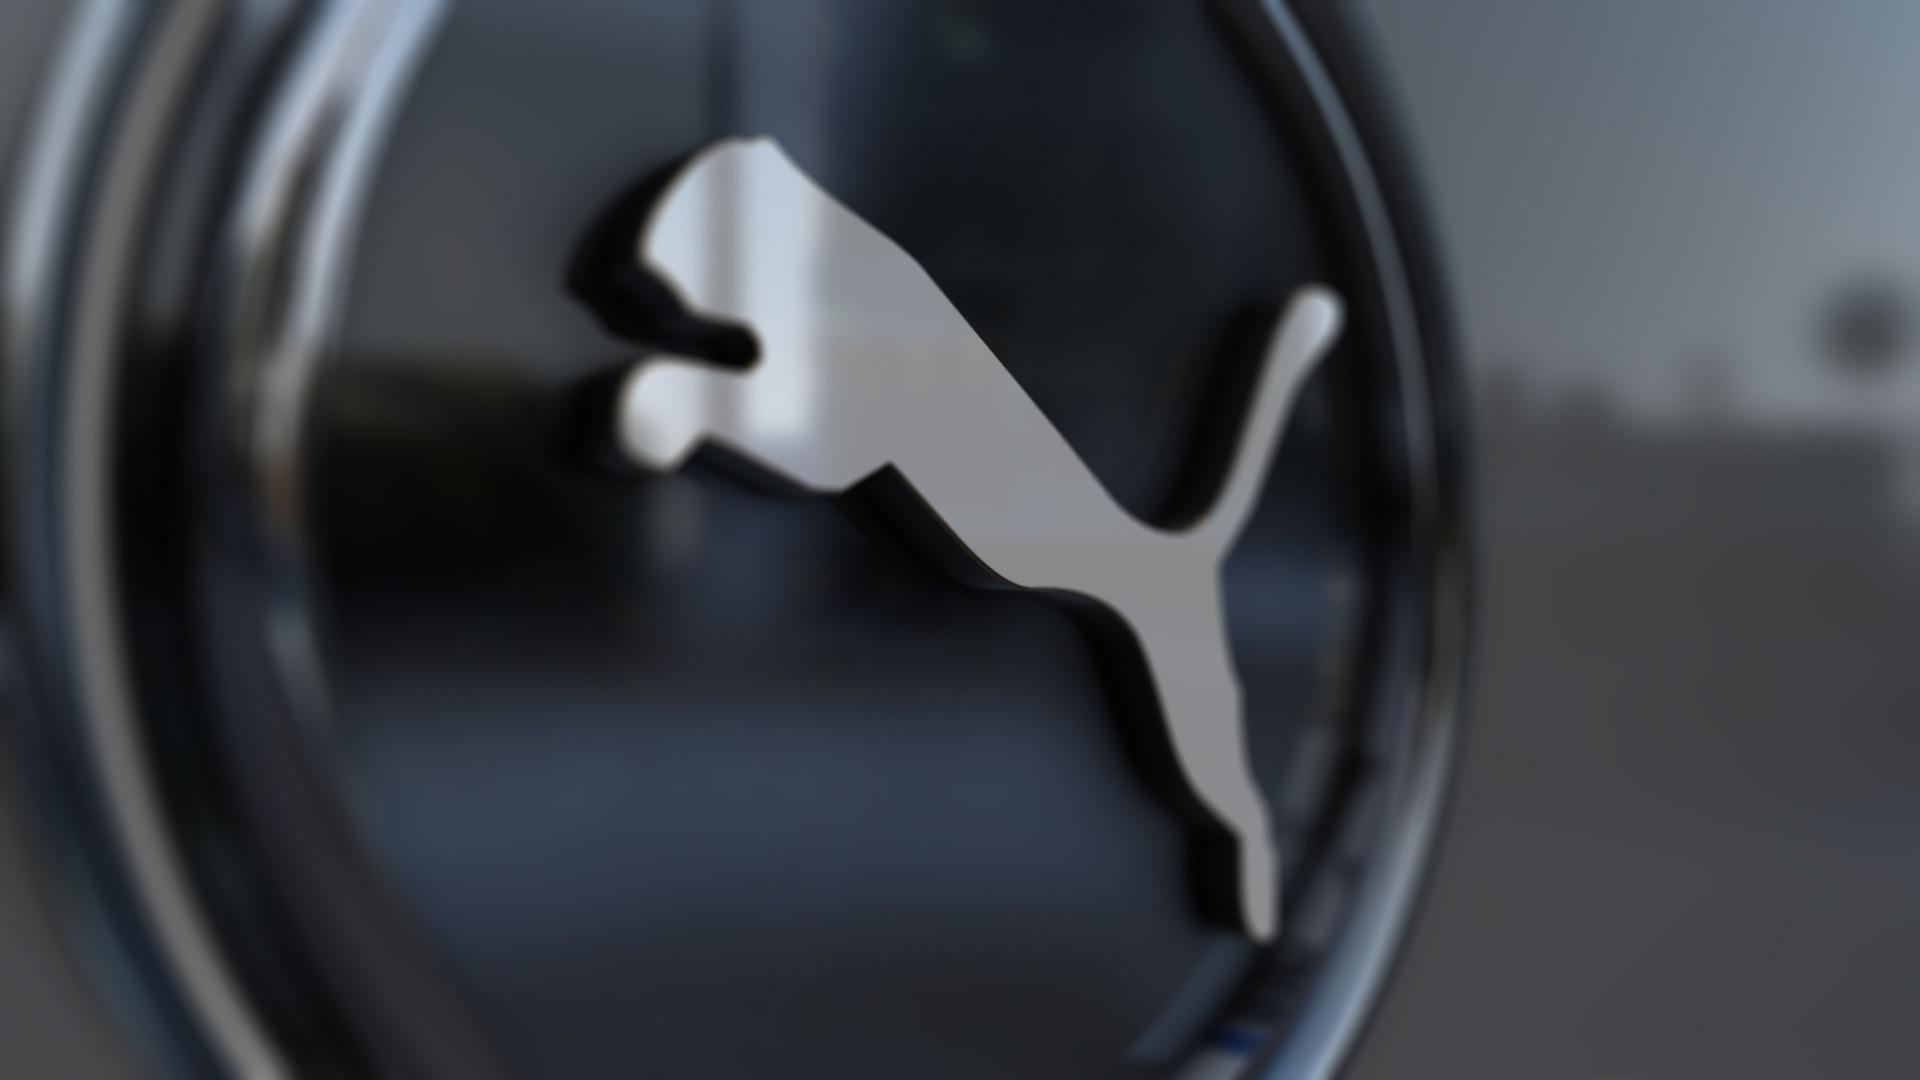 Puma 3d Brand Logo High Quality Hd Wallpaper Avance